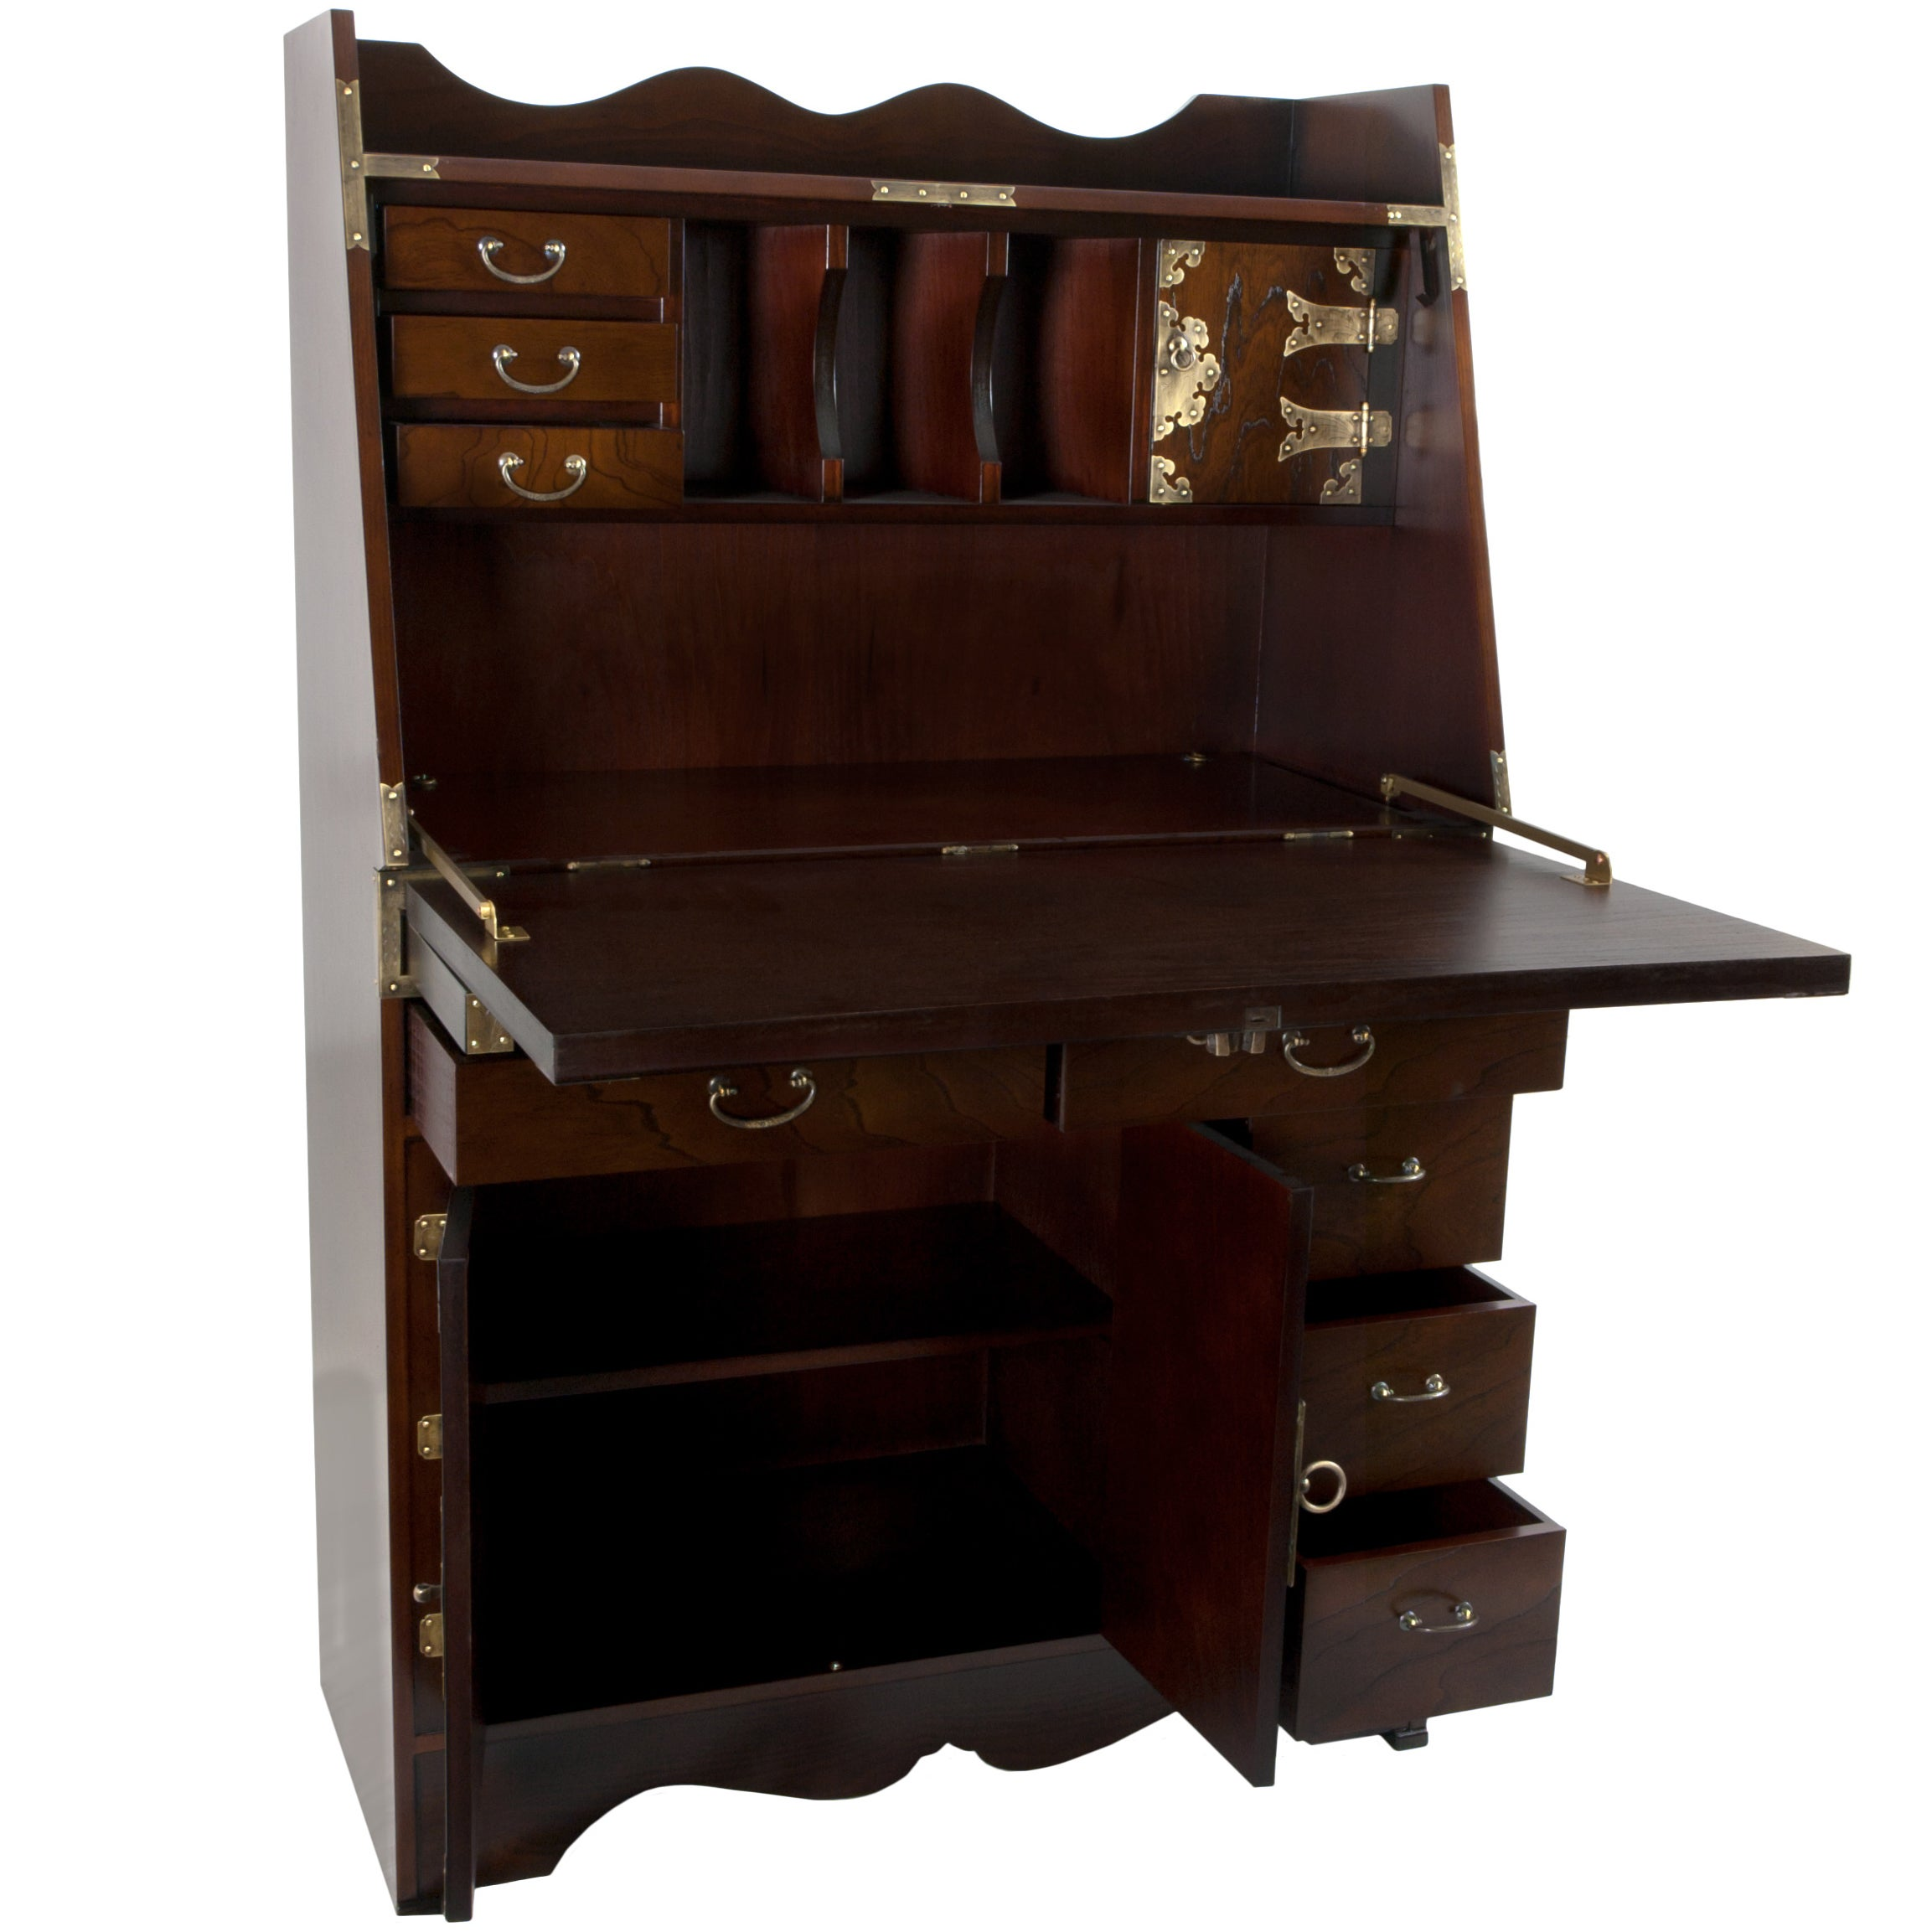 brown product enlarge click home furniture open zbr neli saver space zebra the secretary to classy wbg desk